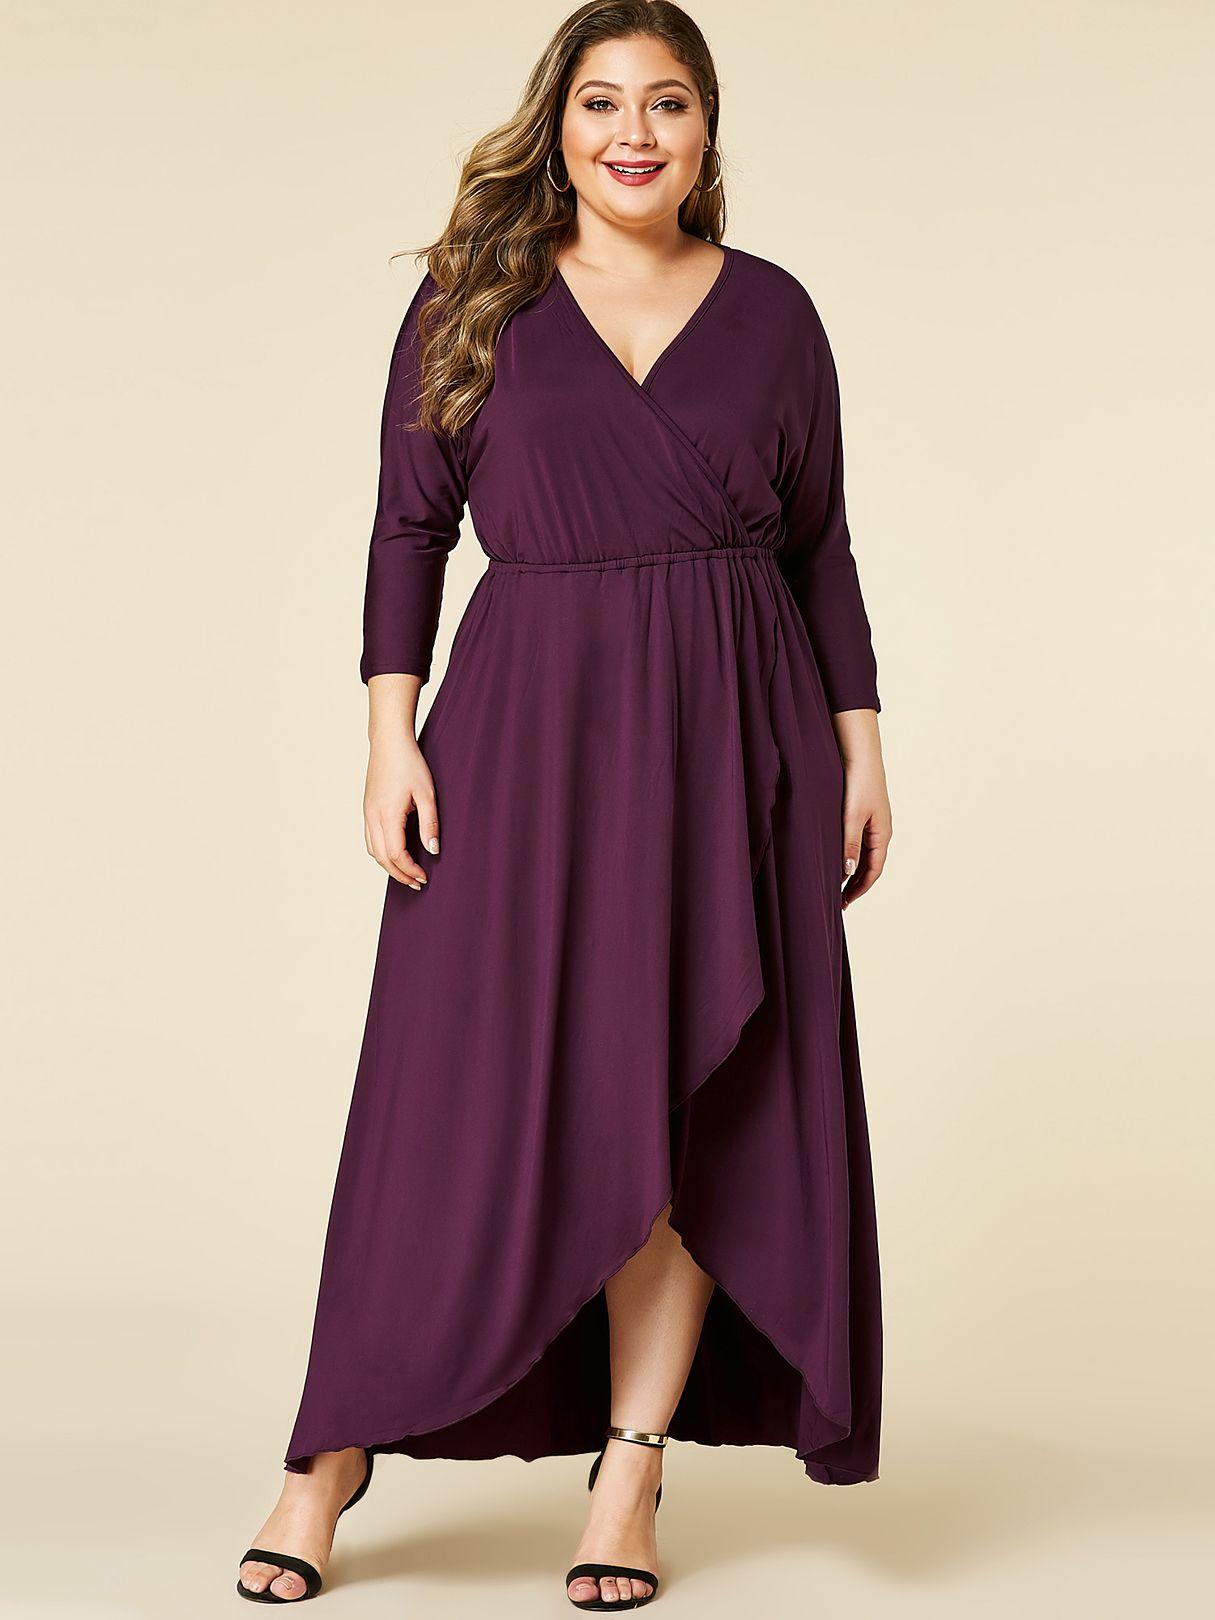 Deep v neck long sleeve dress mixed shop long sleeve